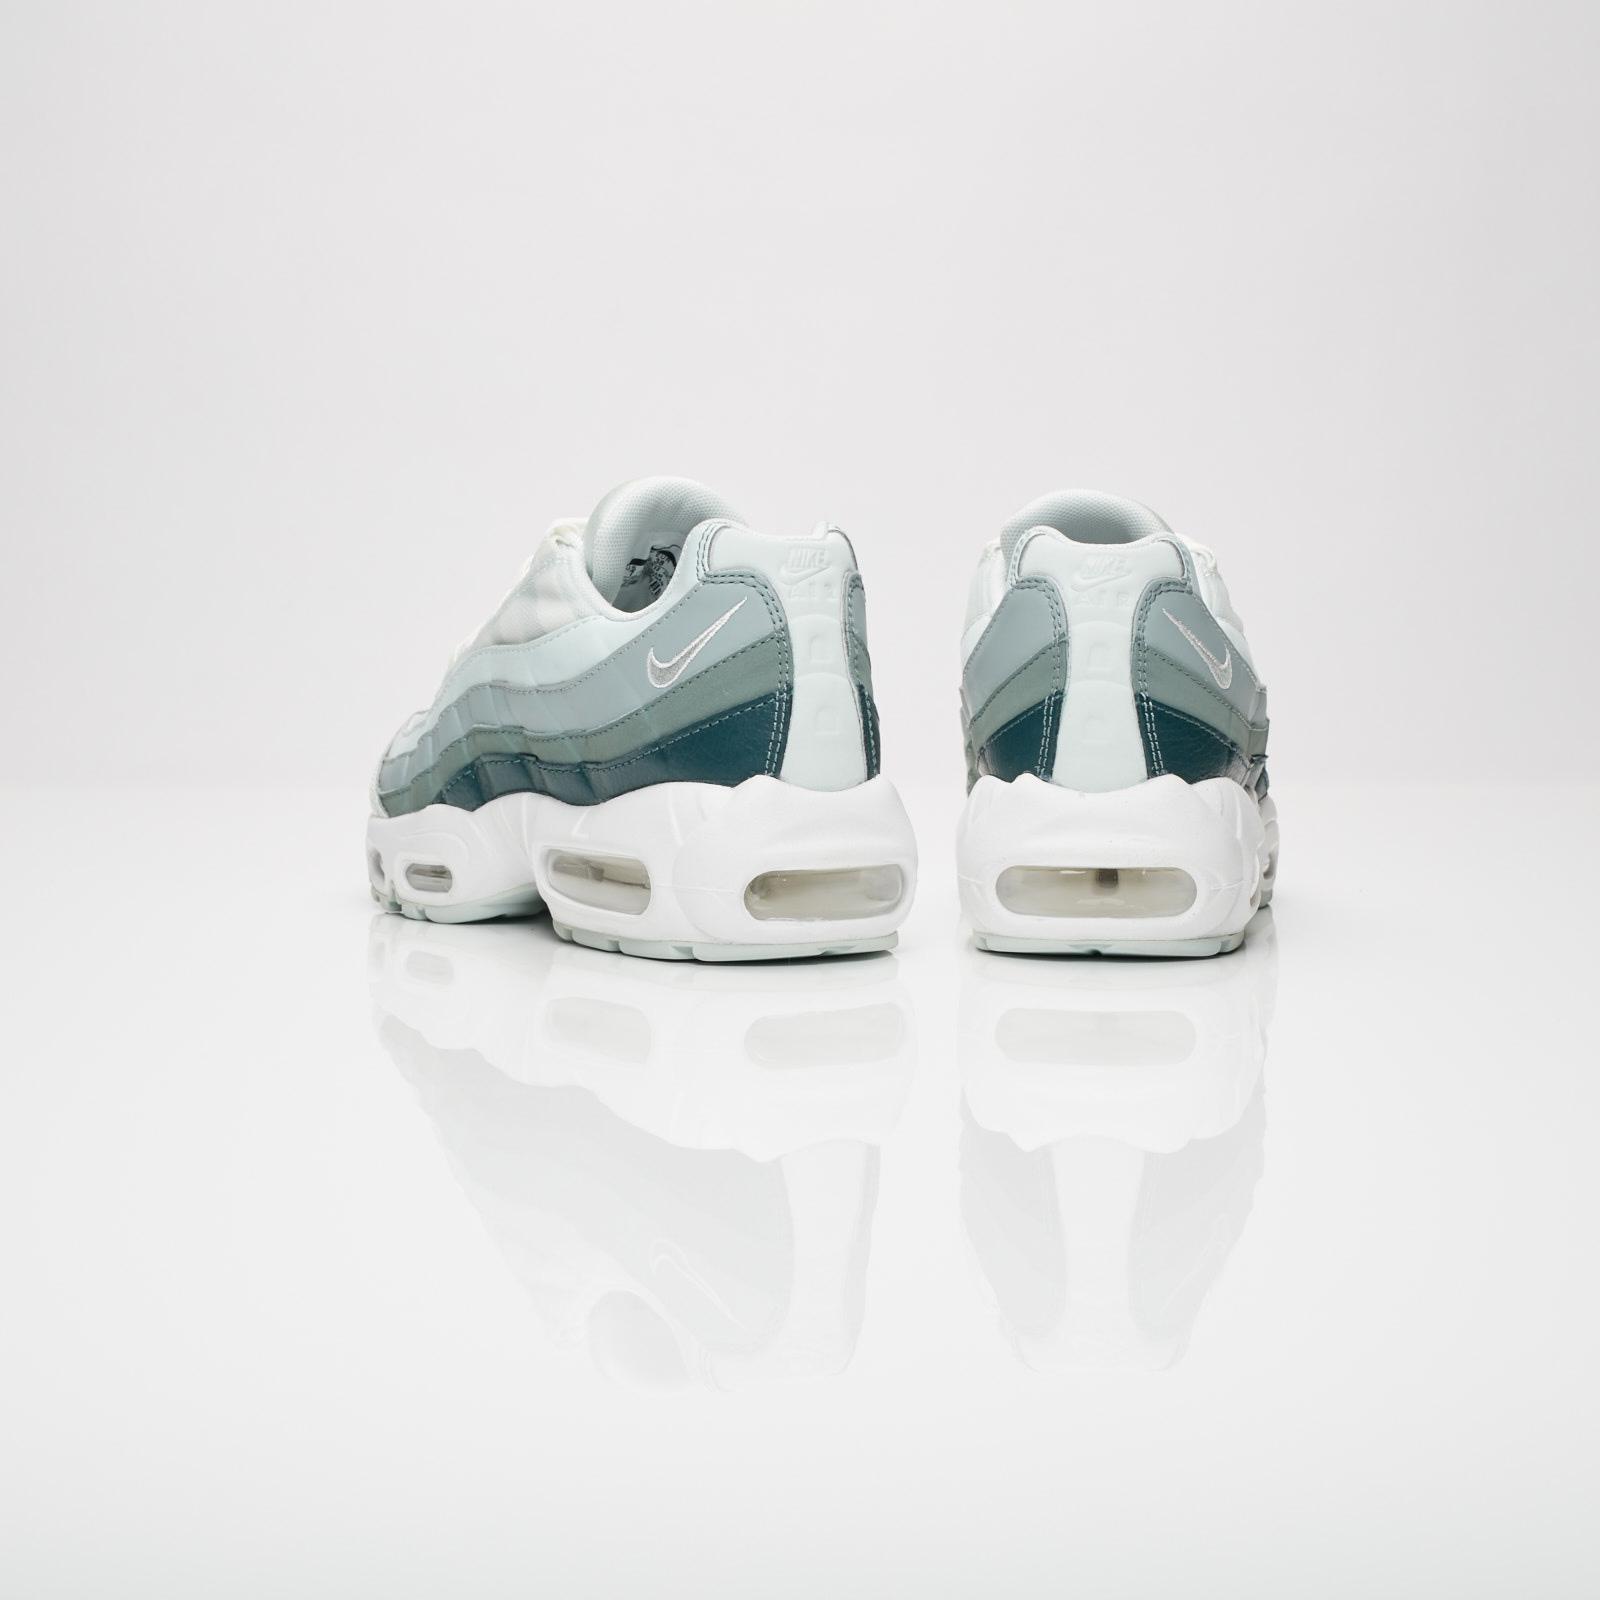 46bc16644b Nike Wmns Air Max 95 - 307960-013 - Sneakersnstuff | sneakers & streetwear  online since 1999